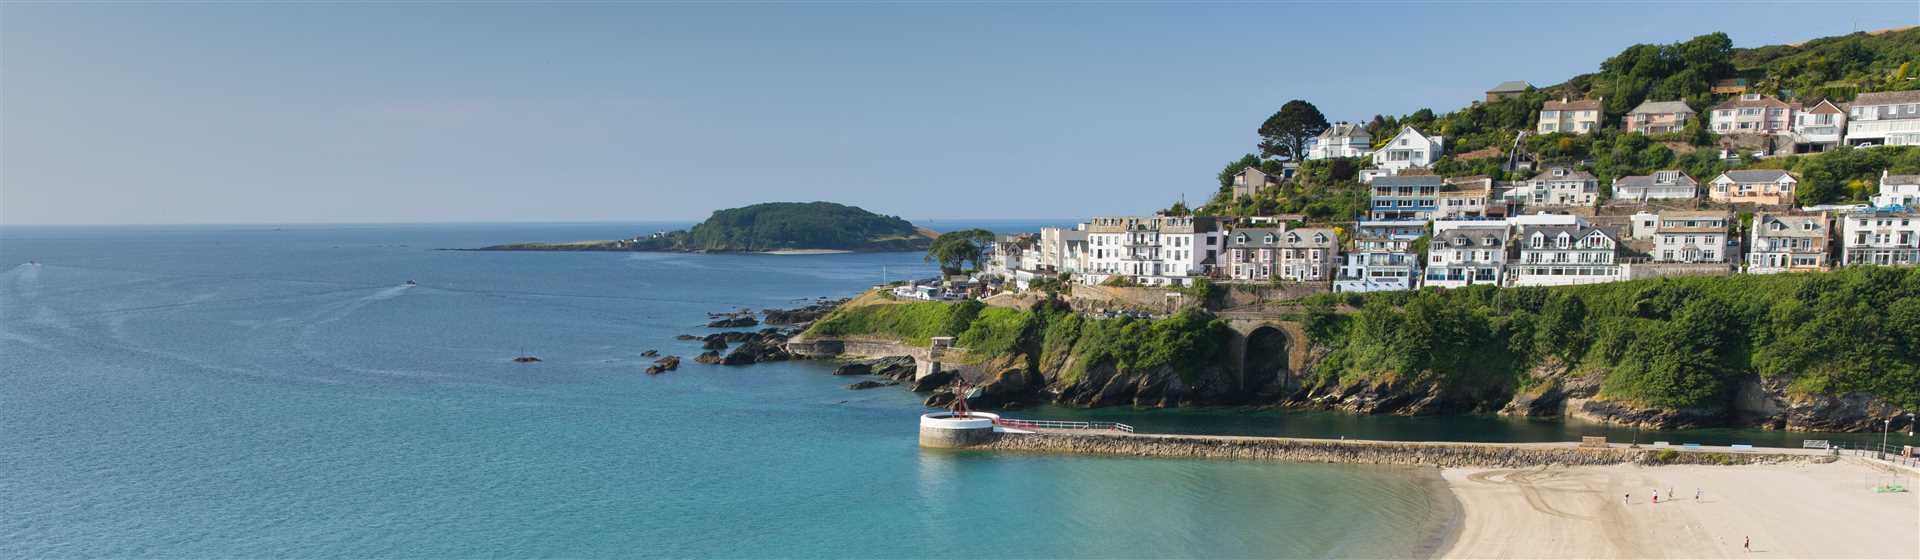 The popular fishing village of Looe on the stunning Cornish Coast